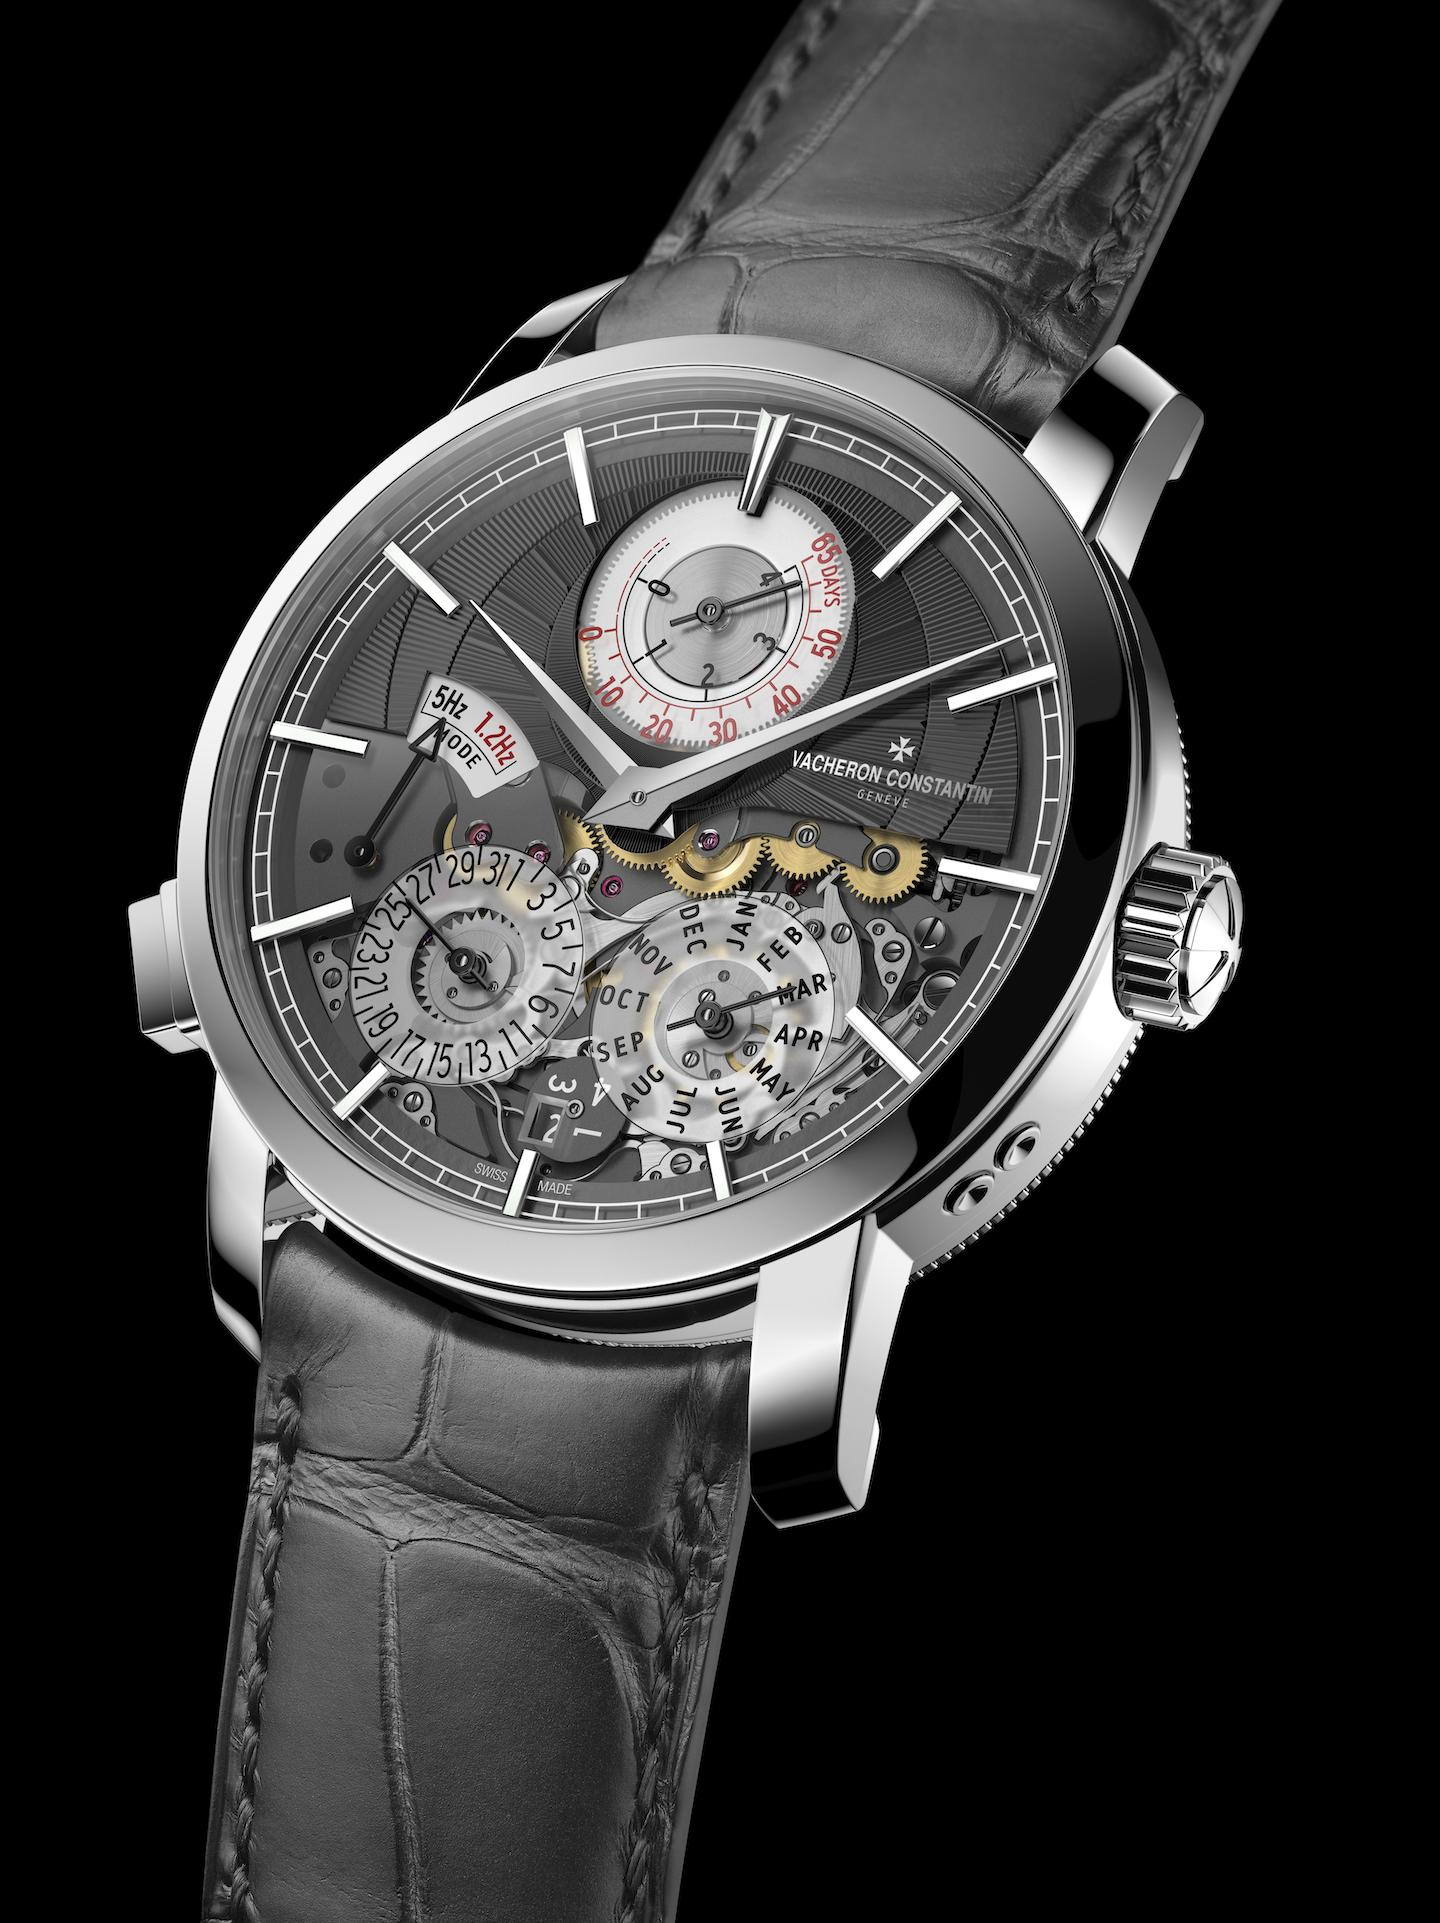 SIHH 2019Vacheron Constantin Traditionnelle Twin Beat (R) Perpetual Calendar watch